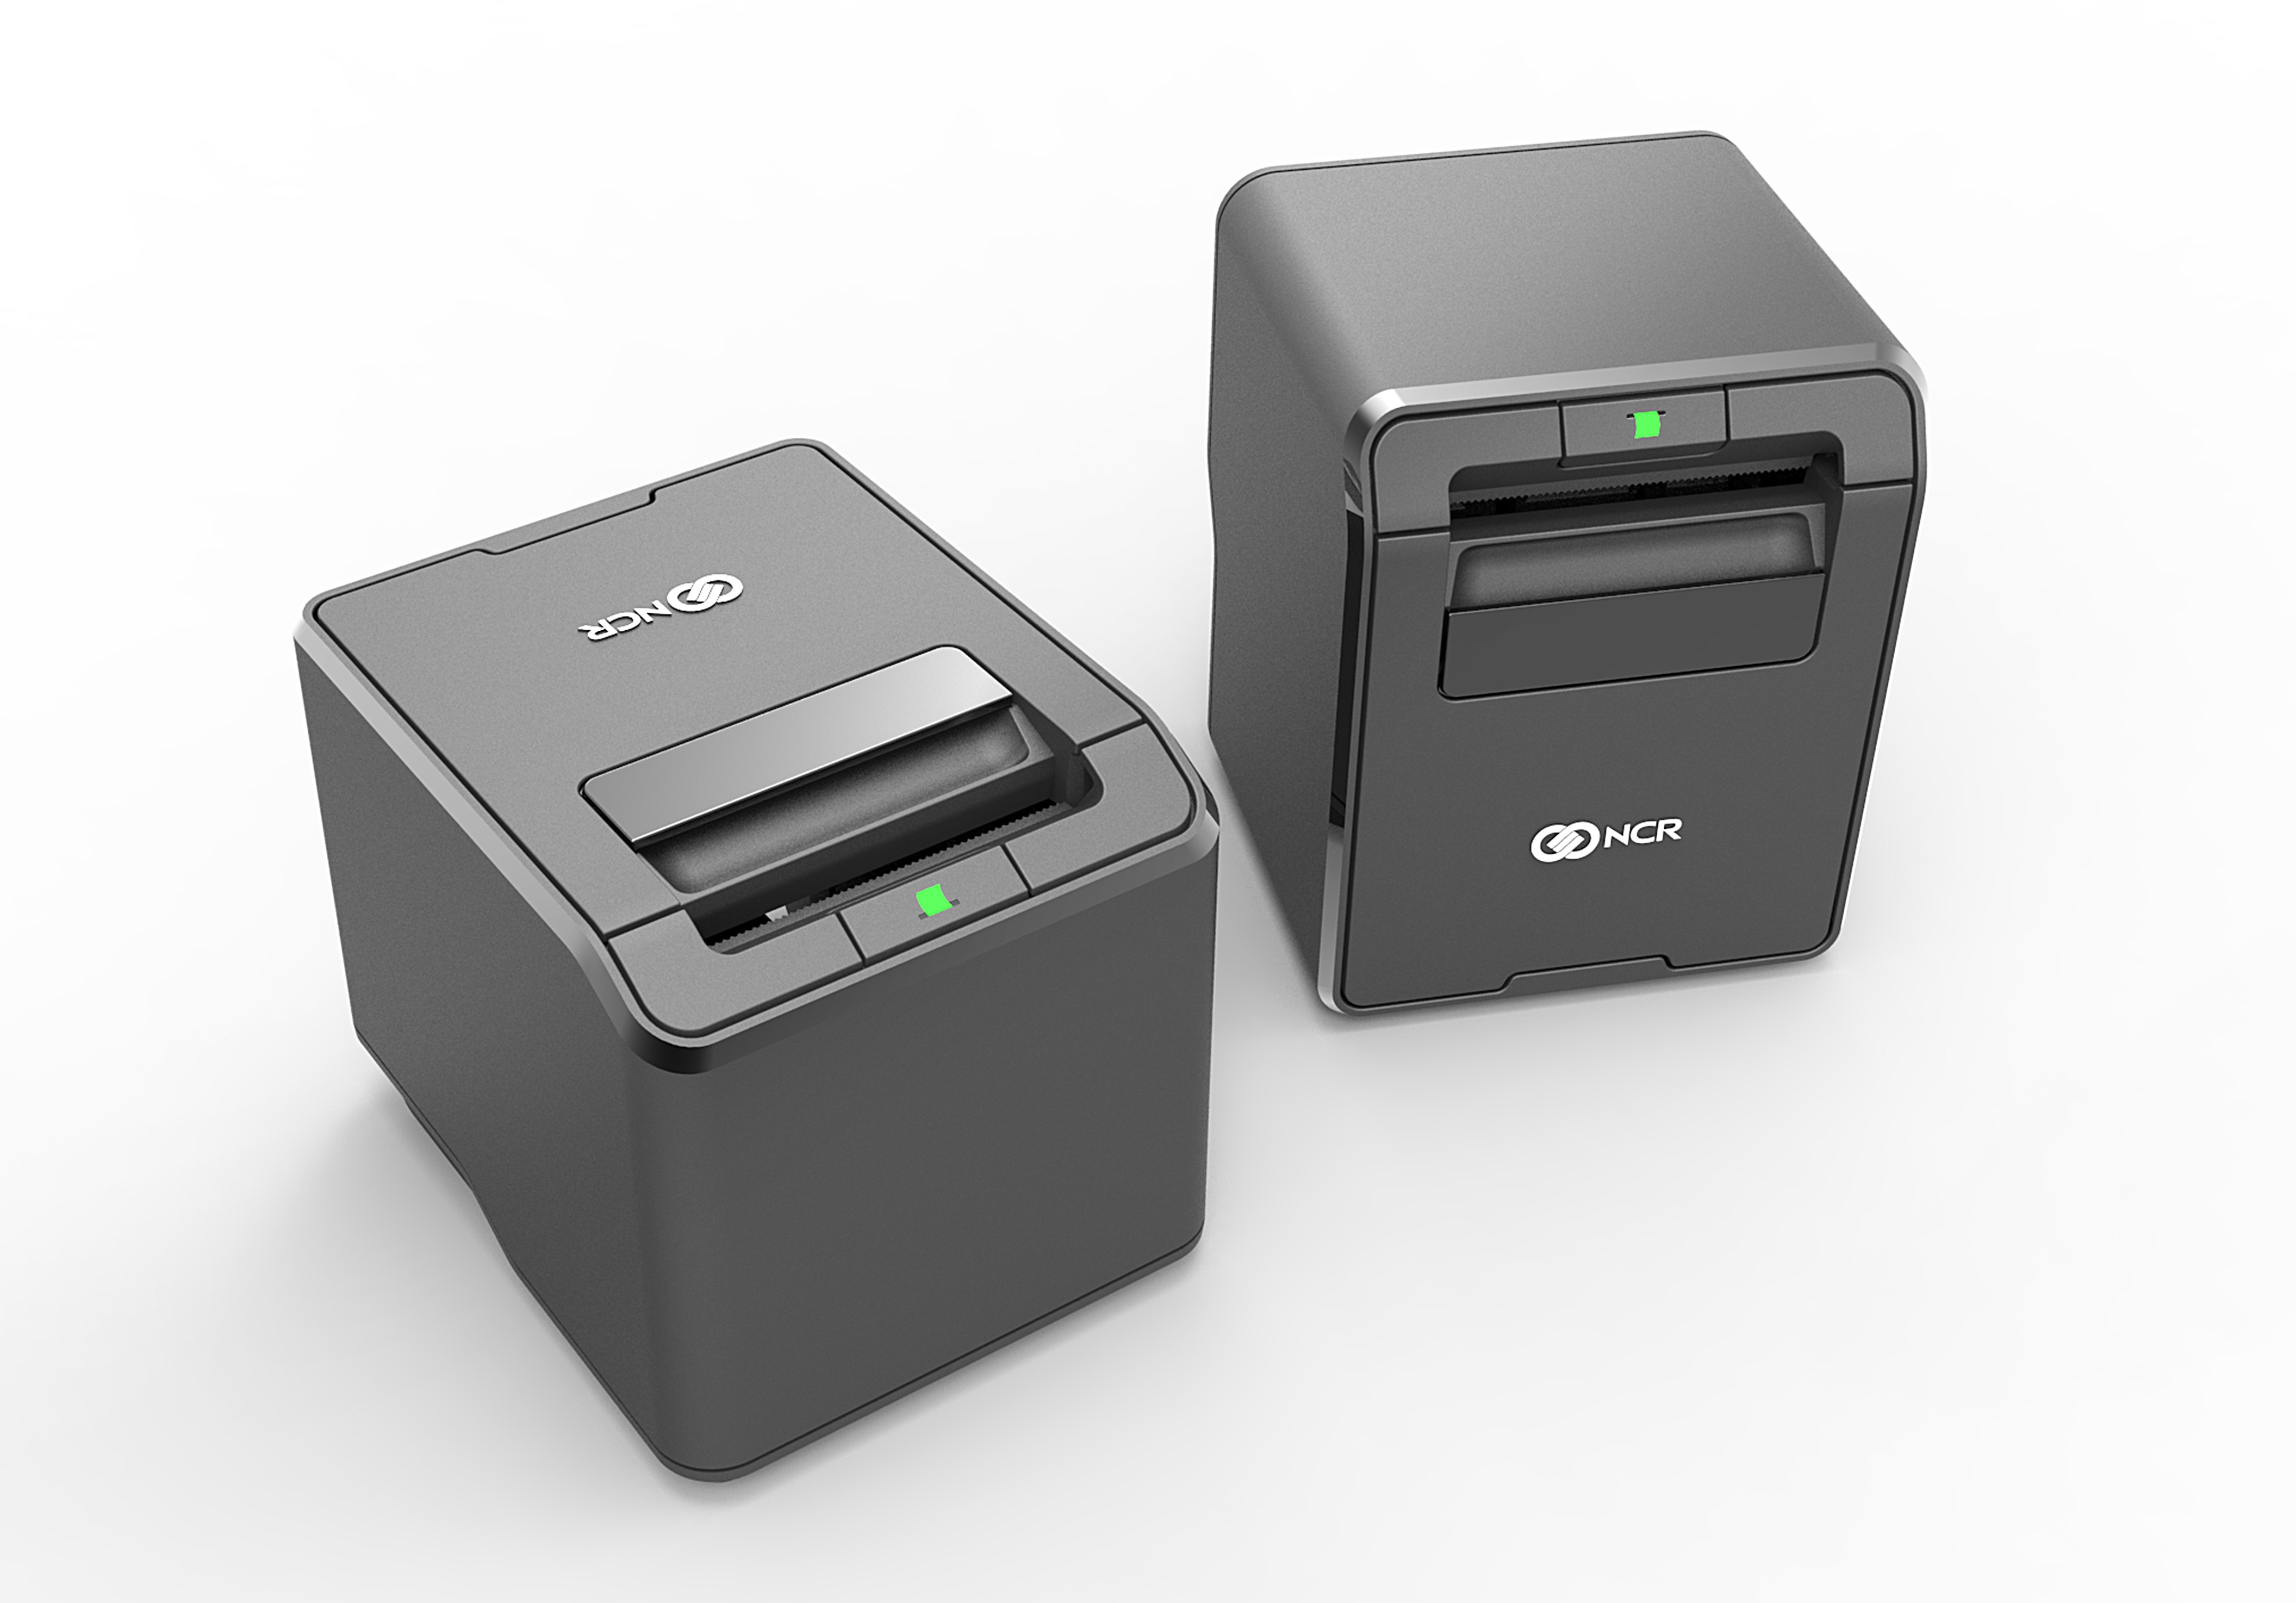 NCR RealPOS 7197 Point of Sale Thermal Printer